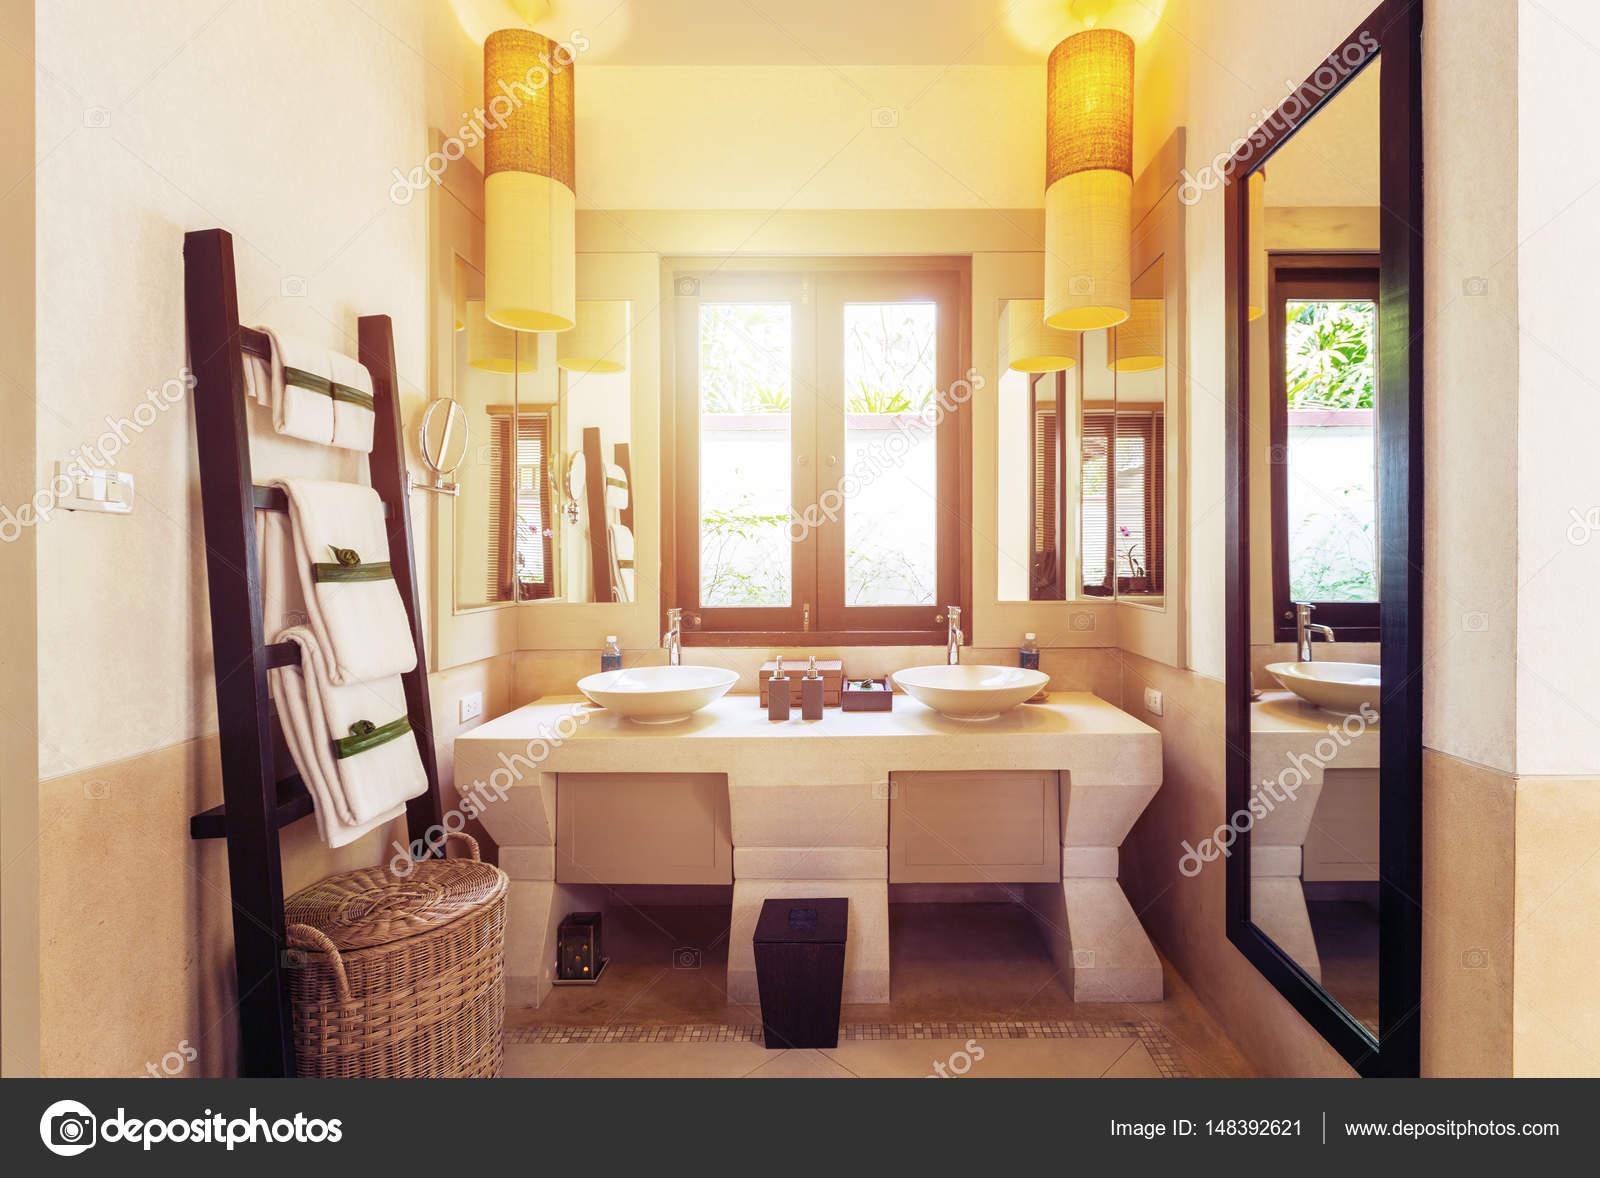 Design Bagno Moderno : Design bagno moderno u foto stock annatamila